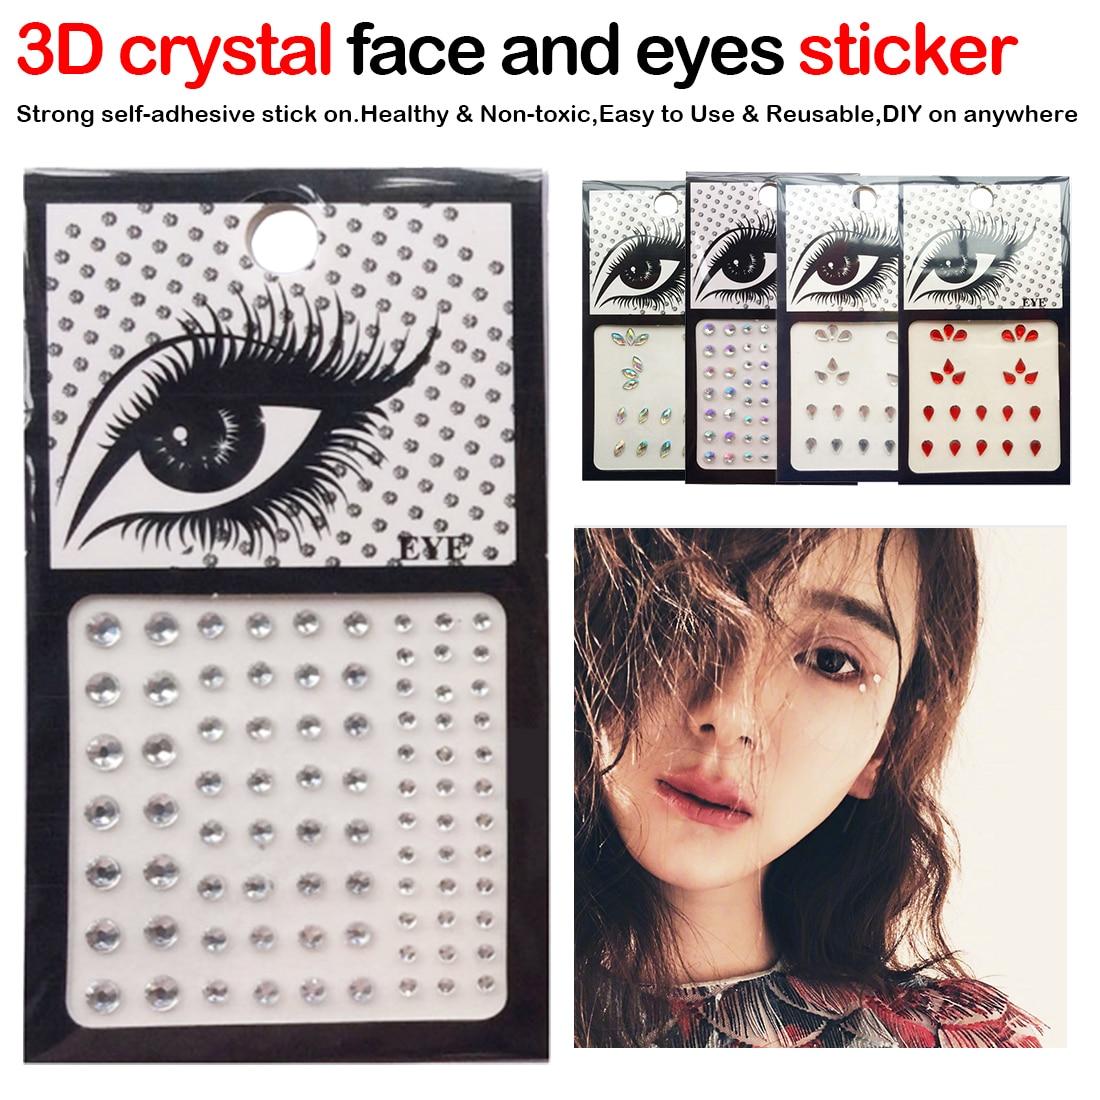 1pcs Glitter Hand-picked 3D Crystal Rhinestone Face Resin Stickers Drill Eye Jewel Front Decor Temporary Tattoo Sticker